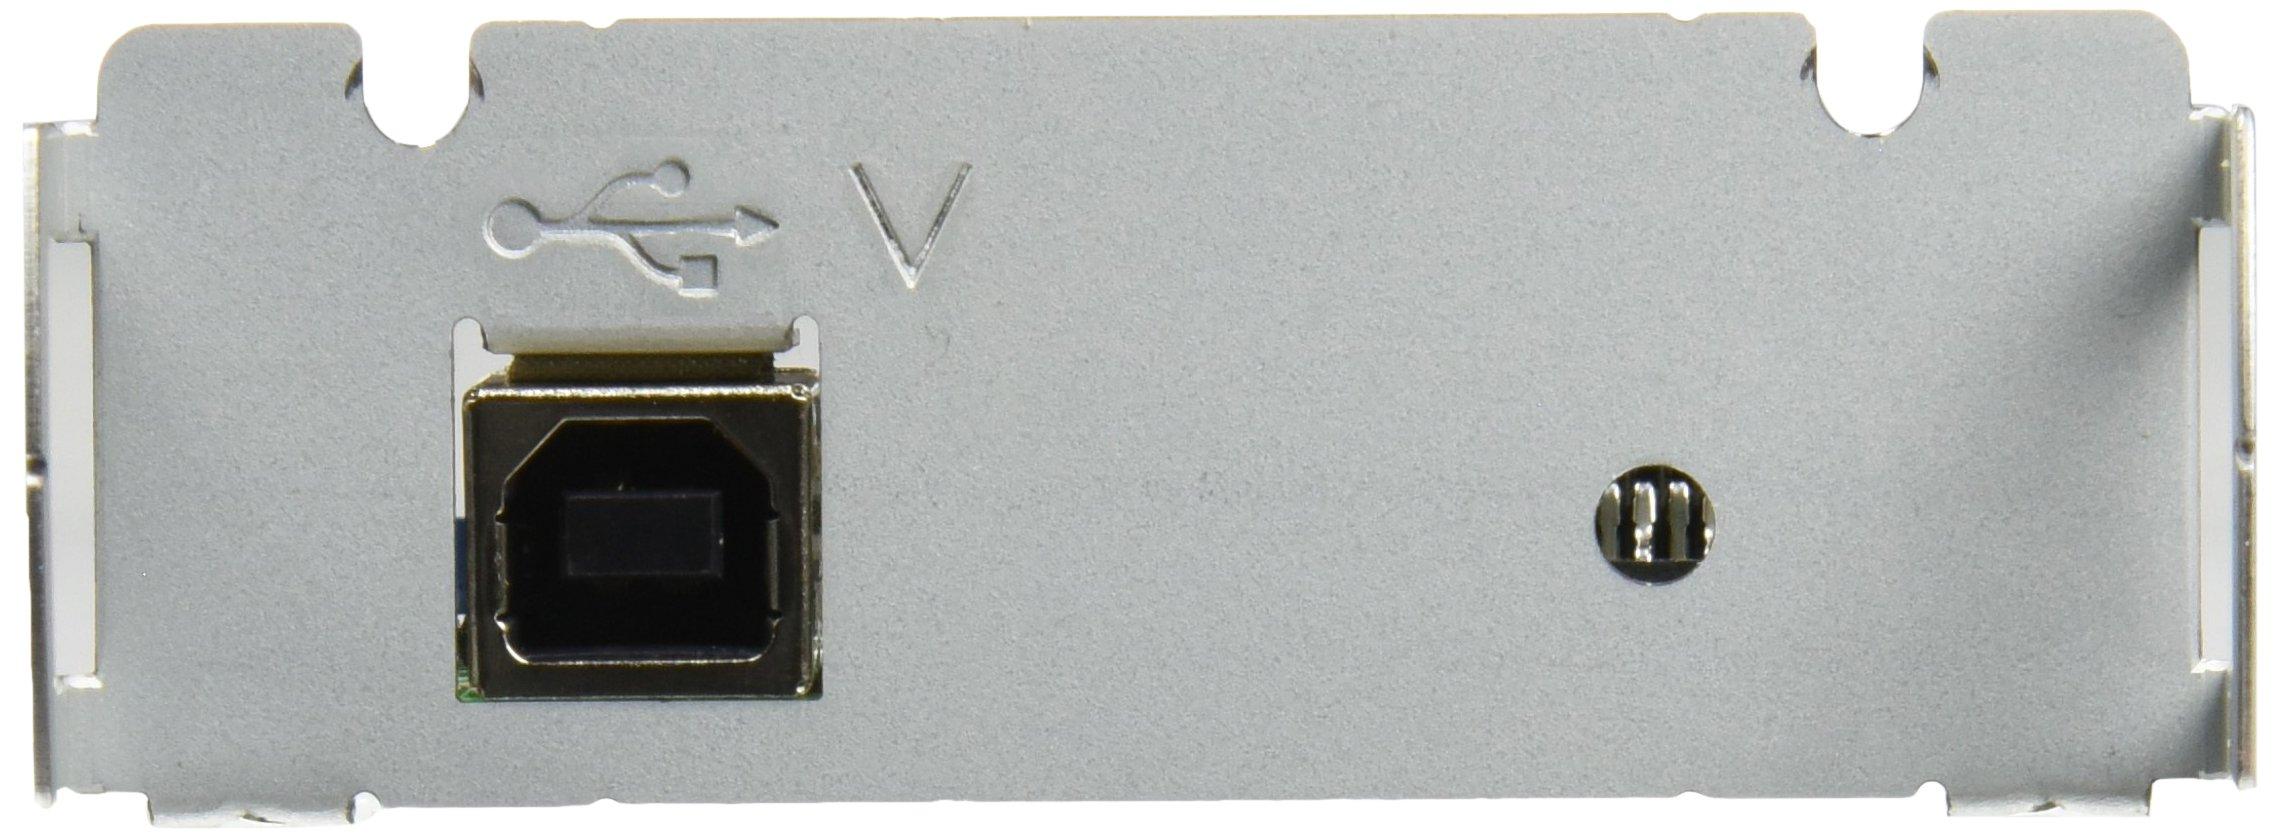 Star Micronics 39607820 USB Interface Board by Star Micronics (Image #3)